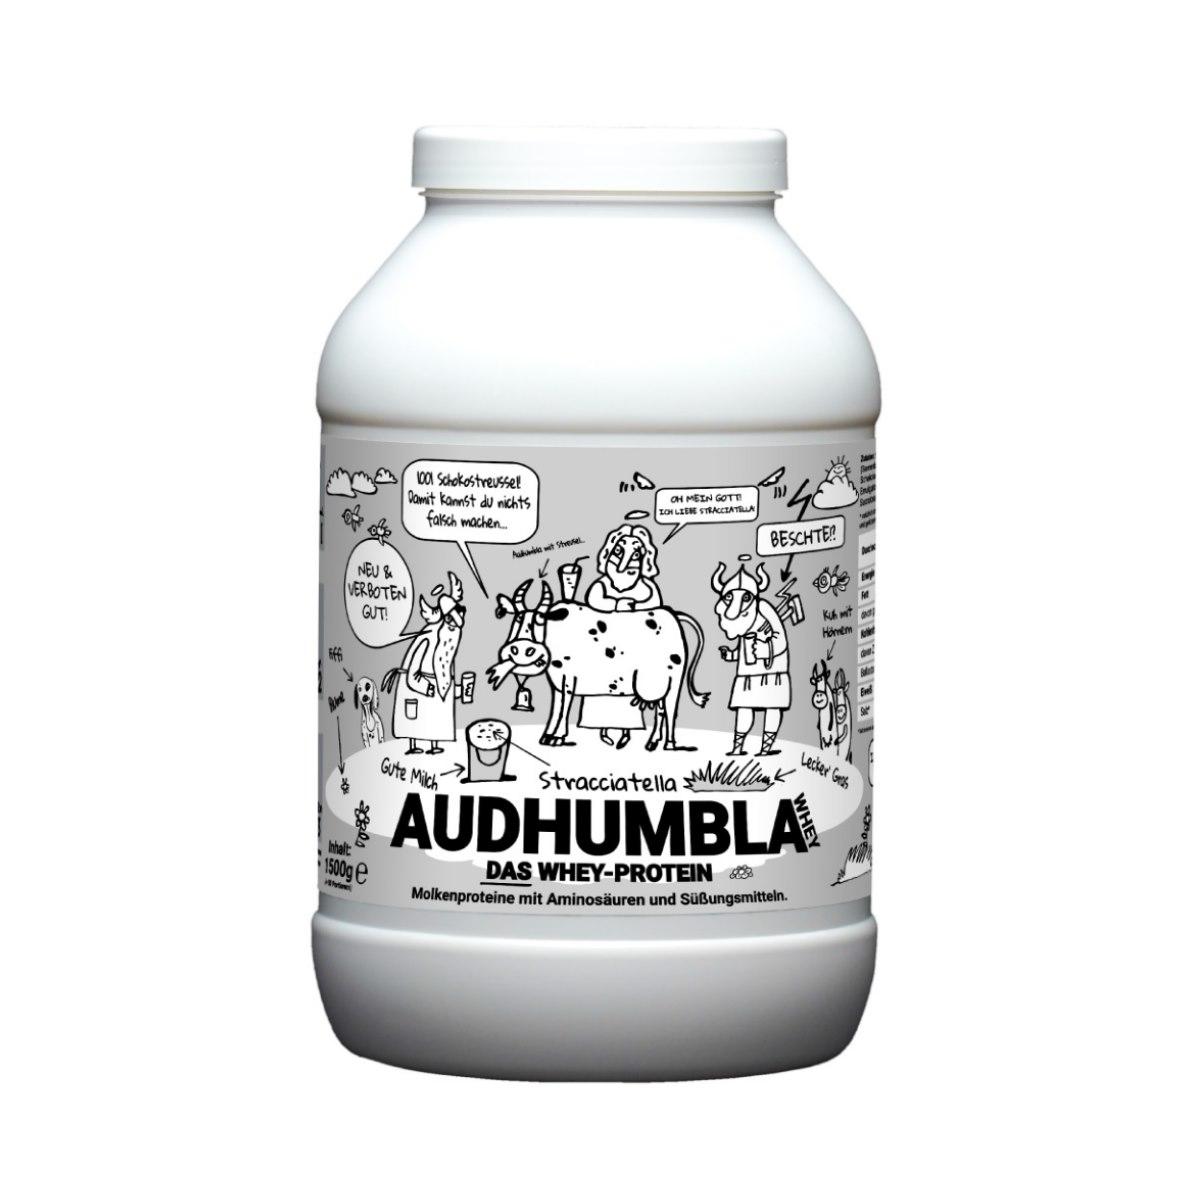 Audhumbla-WHEY-Protein-von-Götterspeise-Stracciatella Bestes Protein